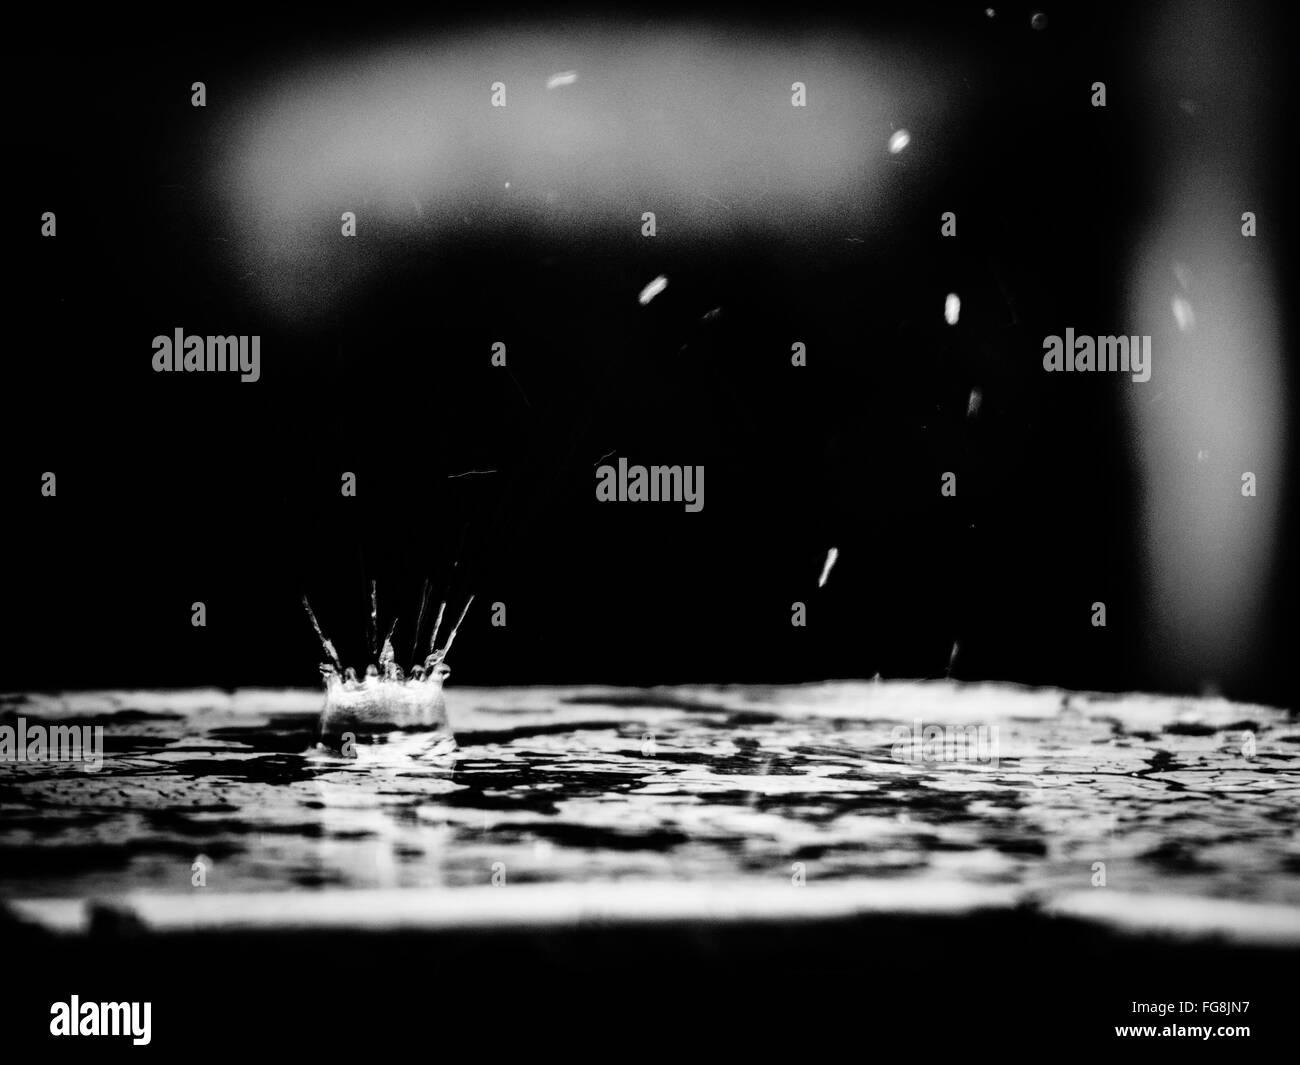 Close-Up Of Splashing Droplet On Puddle - Stock Image